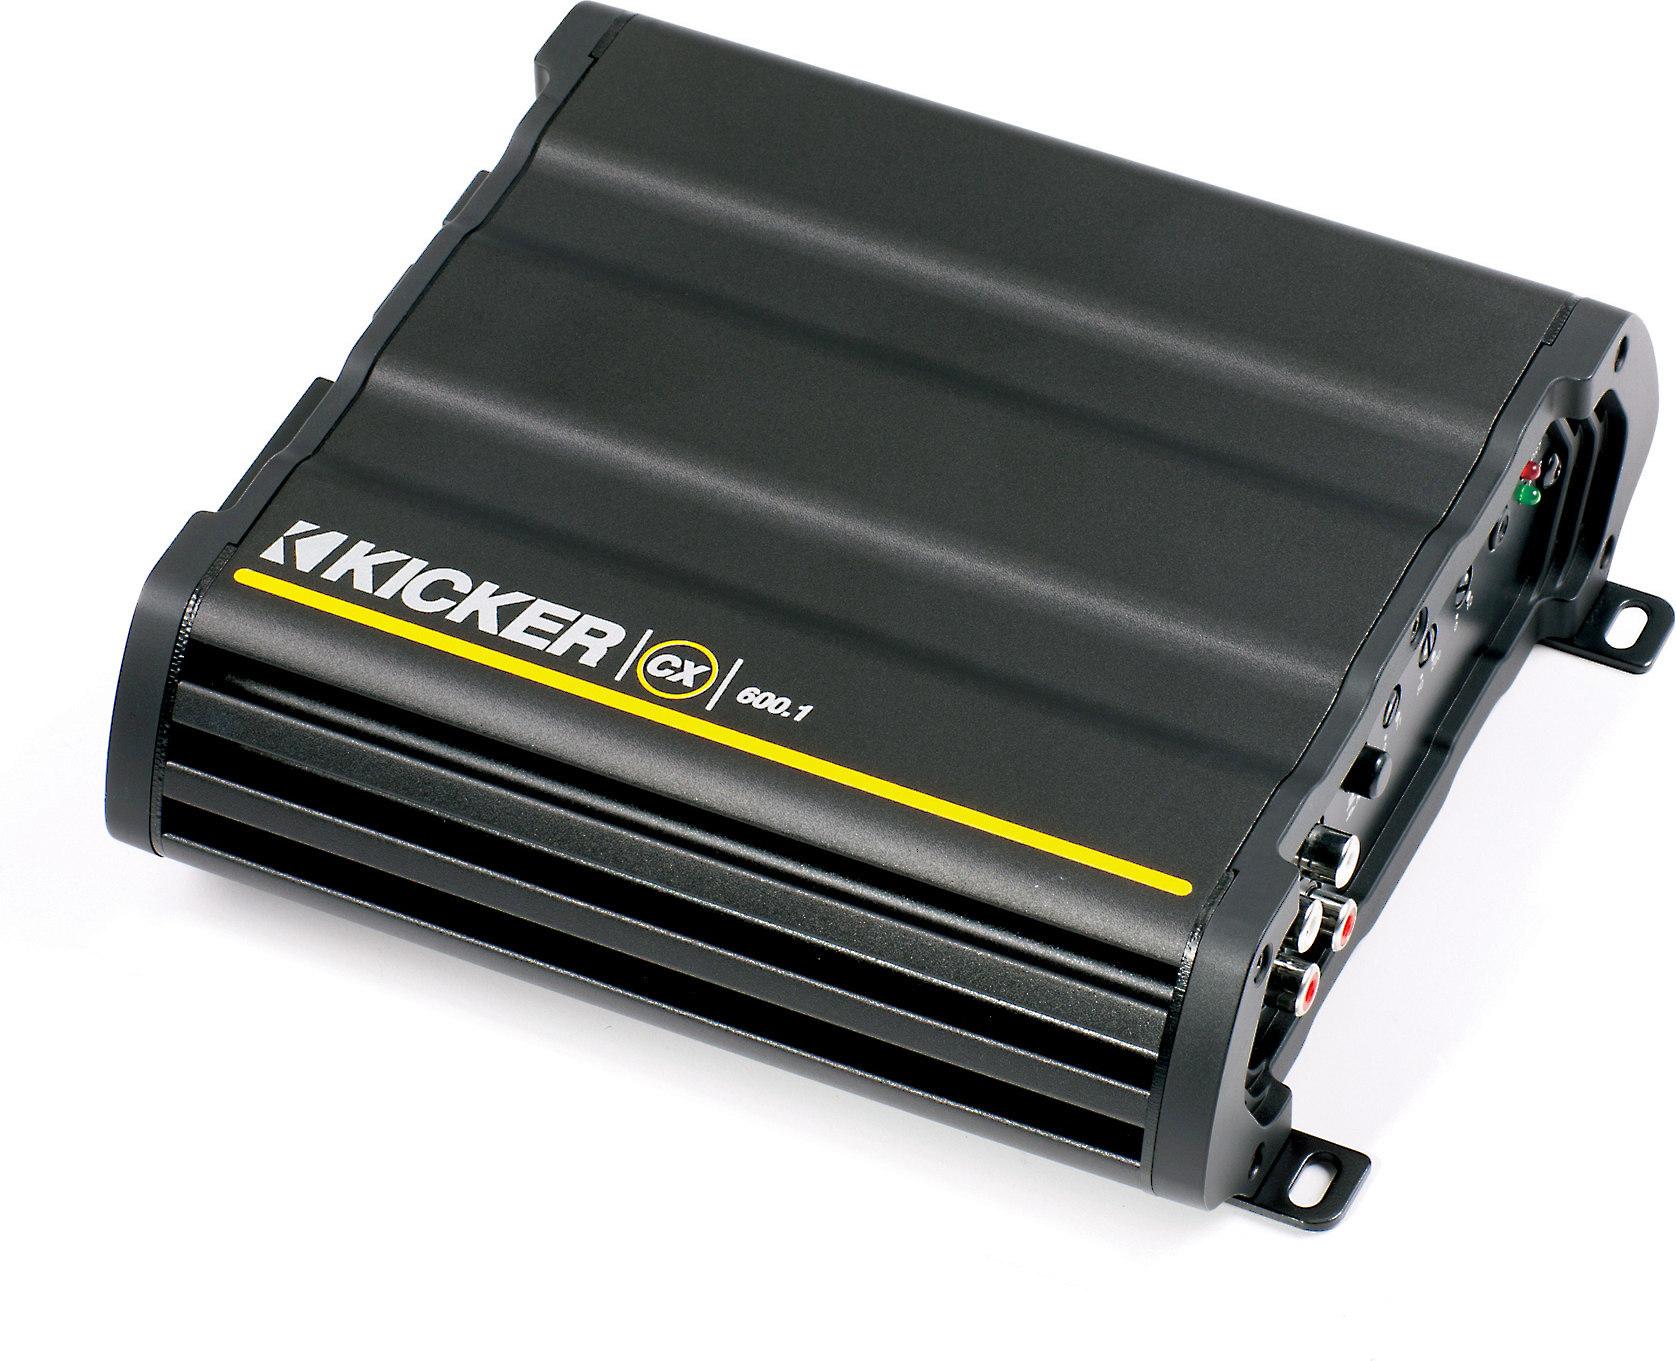 hight resolution of kicker 12cx600 1 mono subwoofer amplifier 600 watts rms x 1 at 2 kicker cx600 1 wiring diagrams